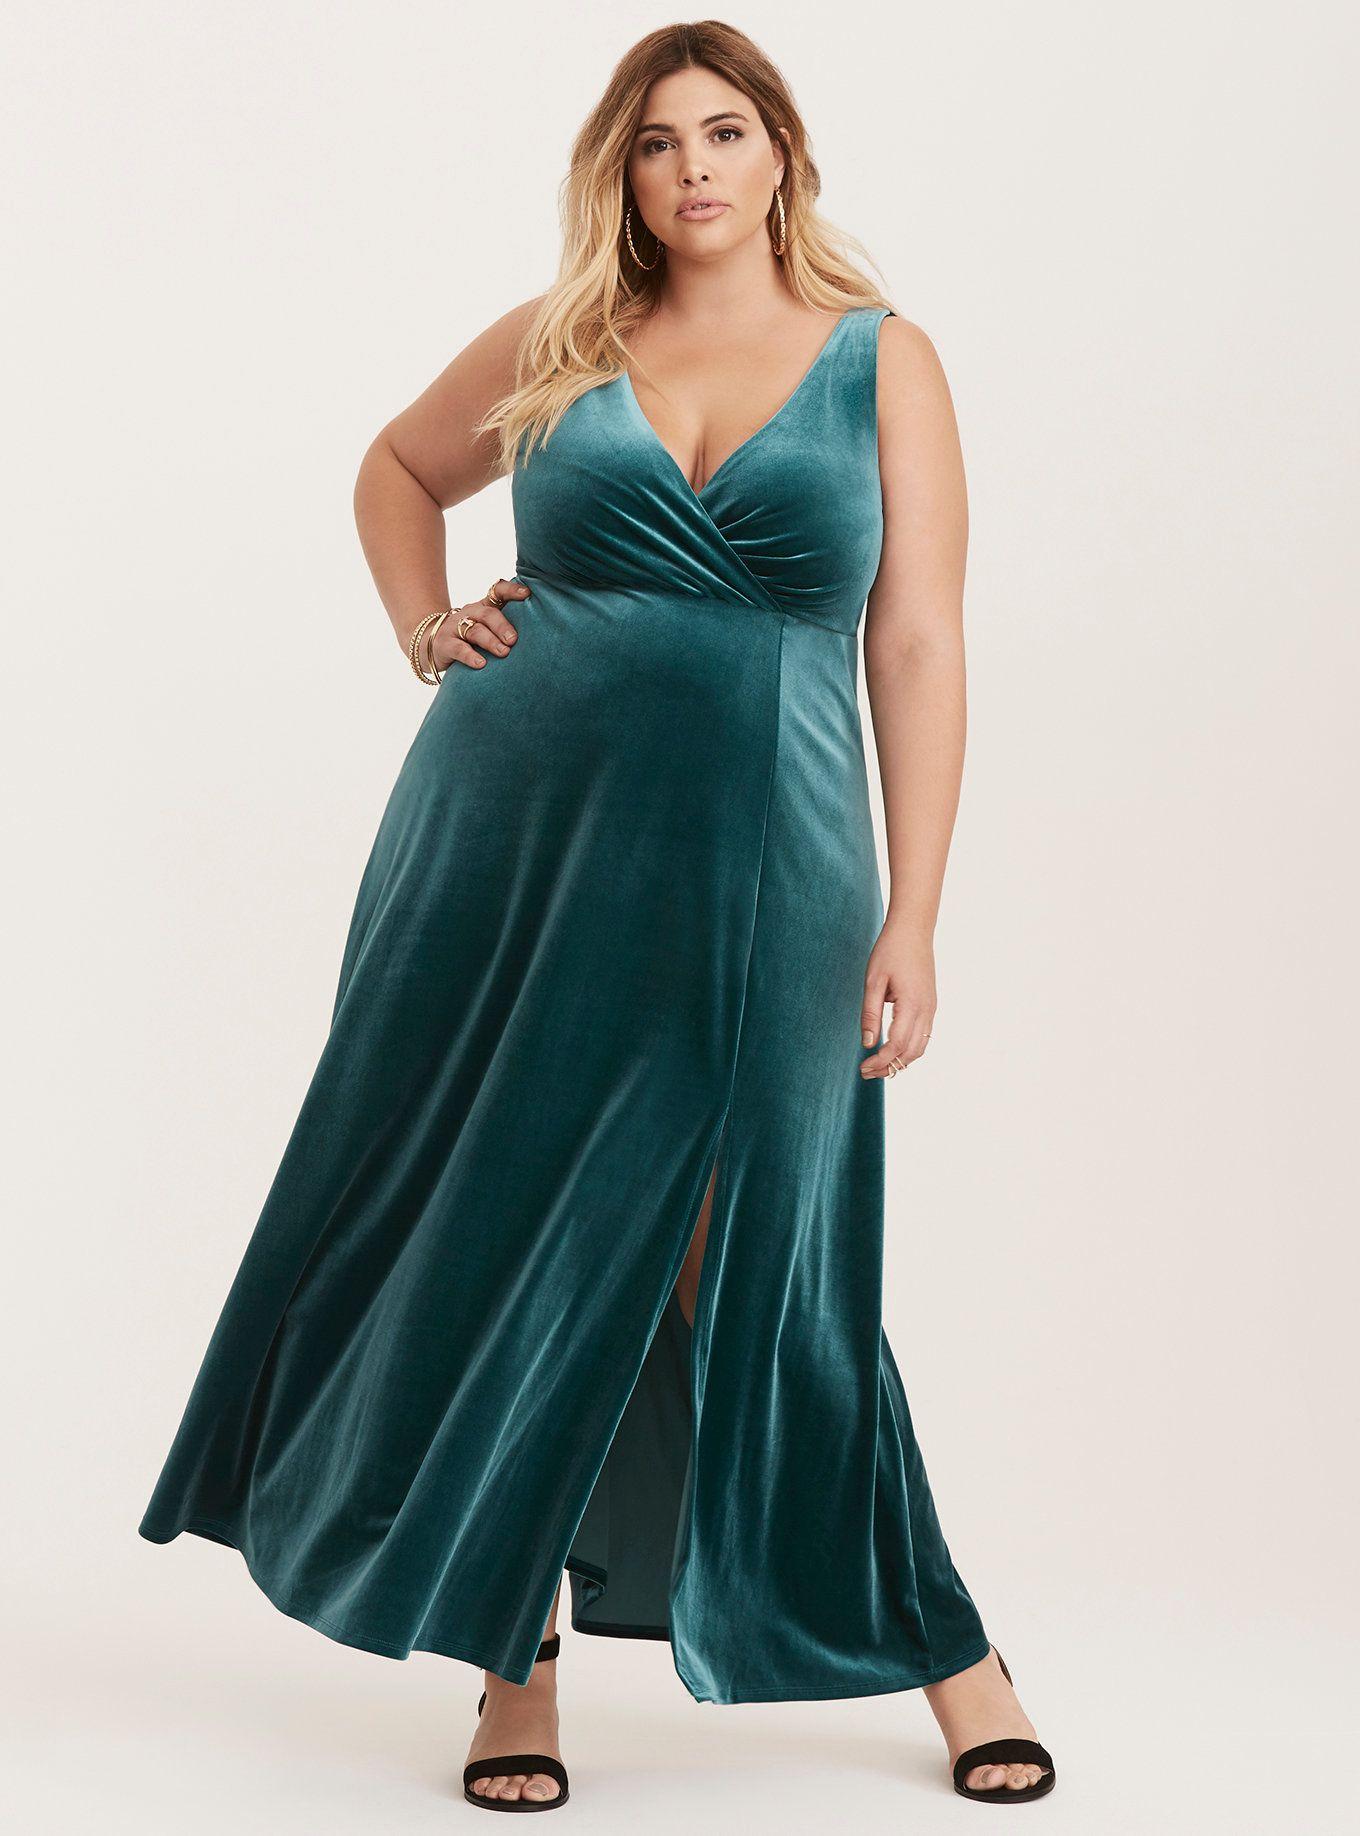 7ffe5f4ae6996 Plus Size Prom Dresses Torrid - Barrier Surveillance